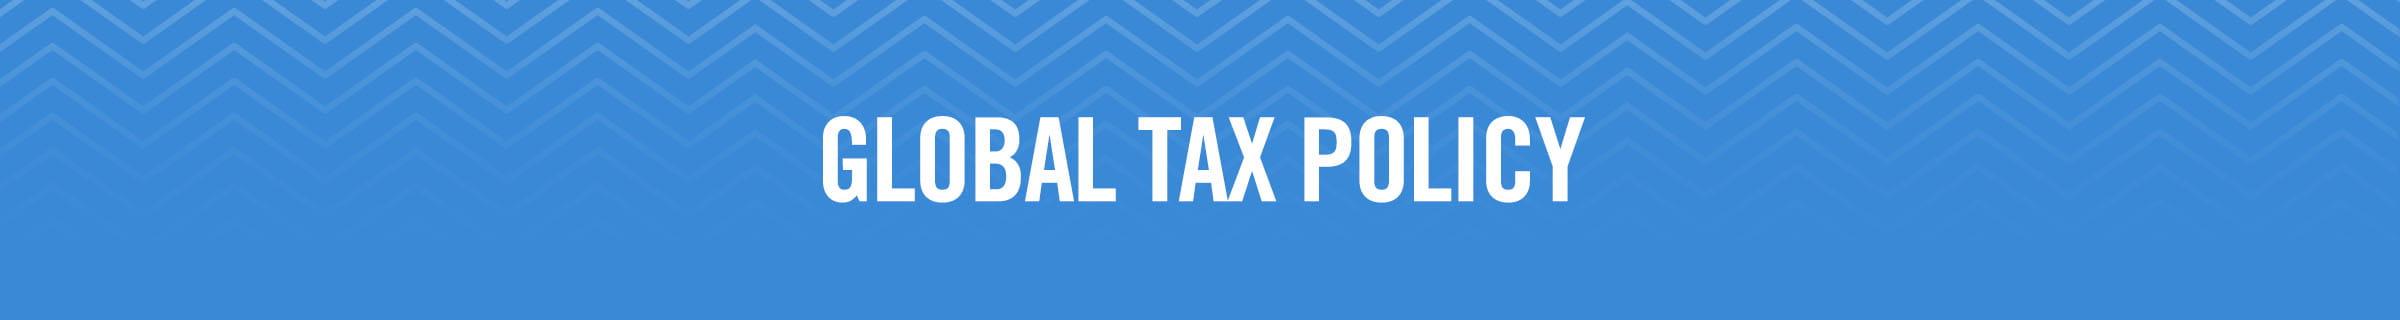 McCormick & Company Global Tax Policy